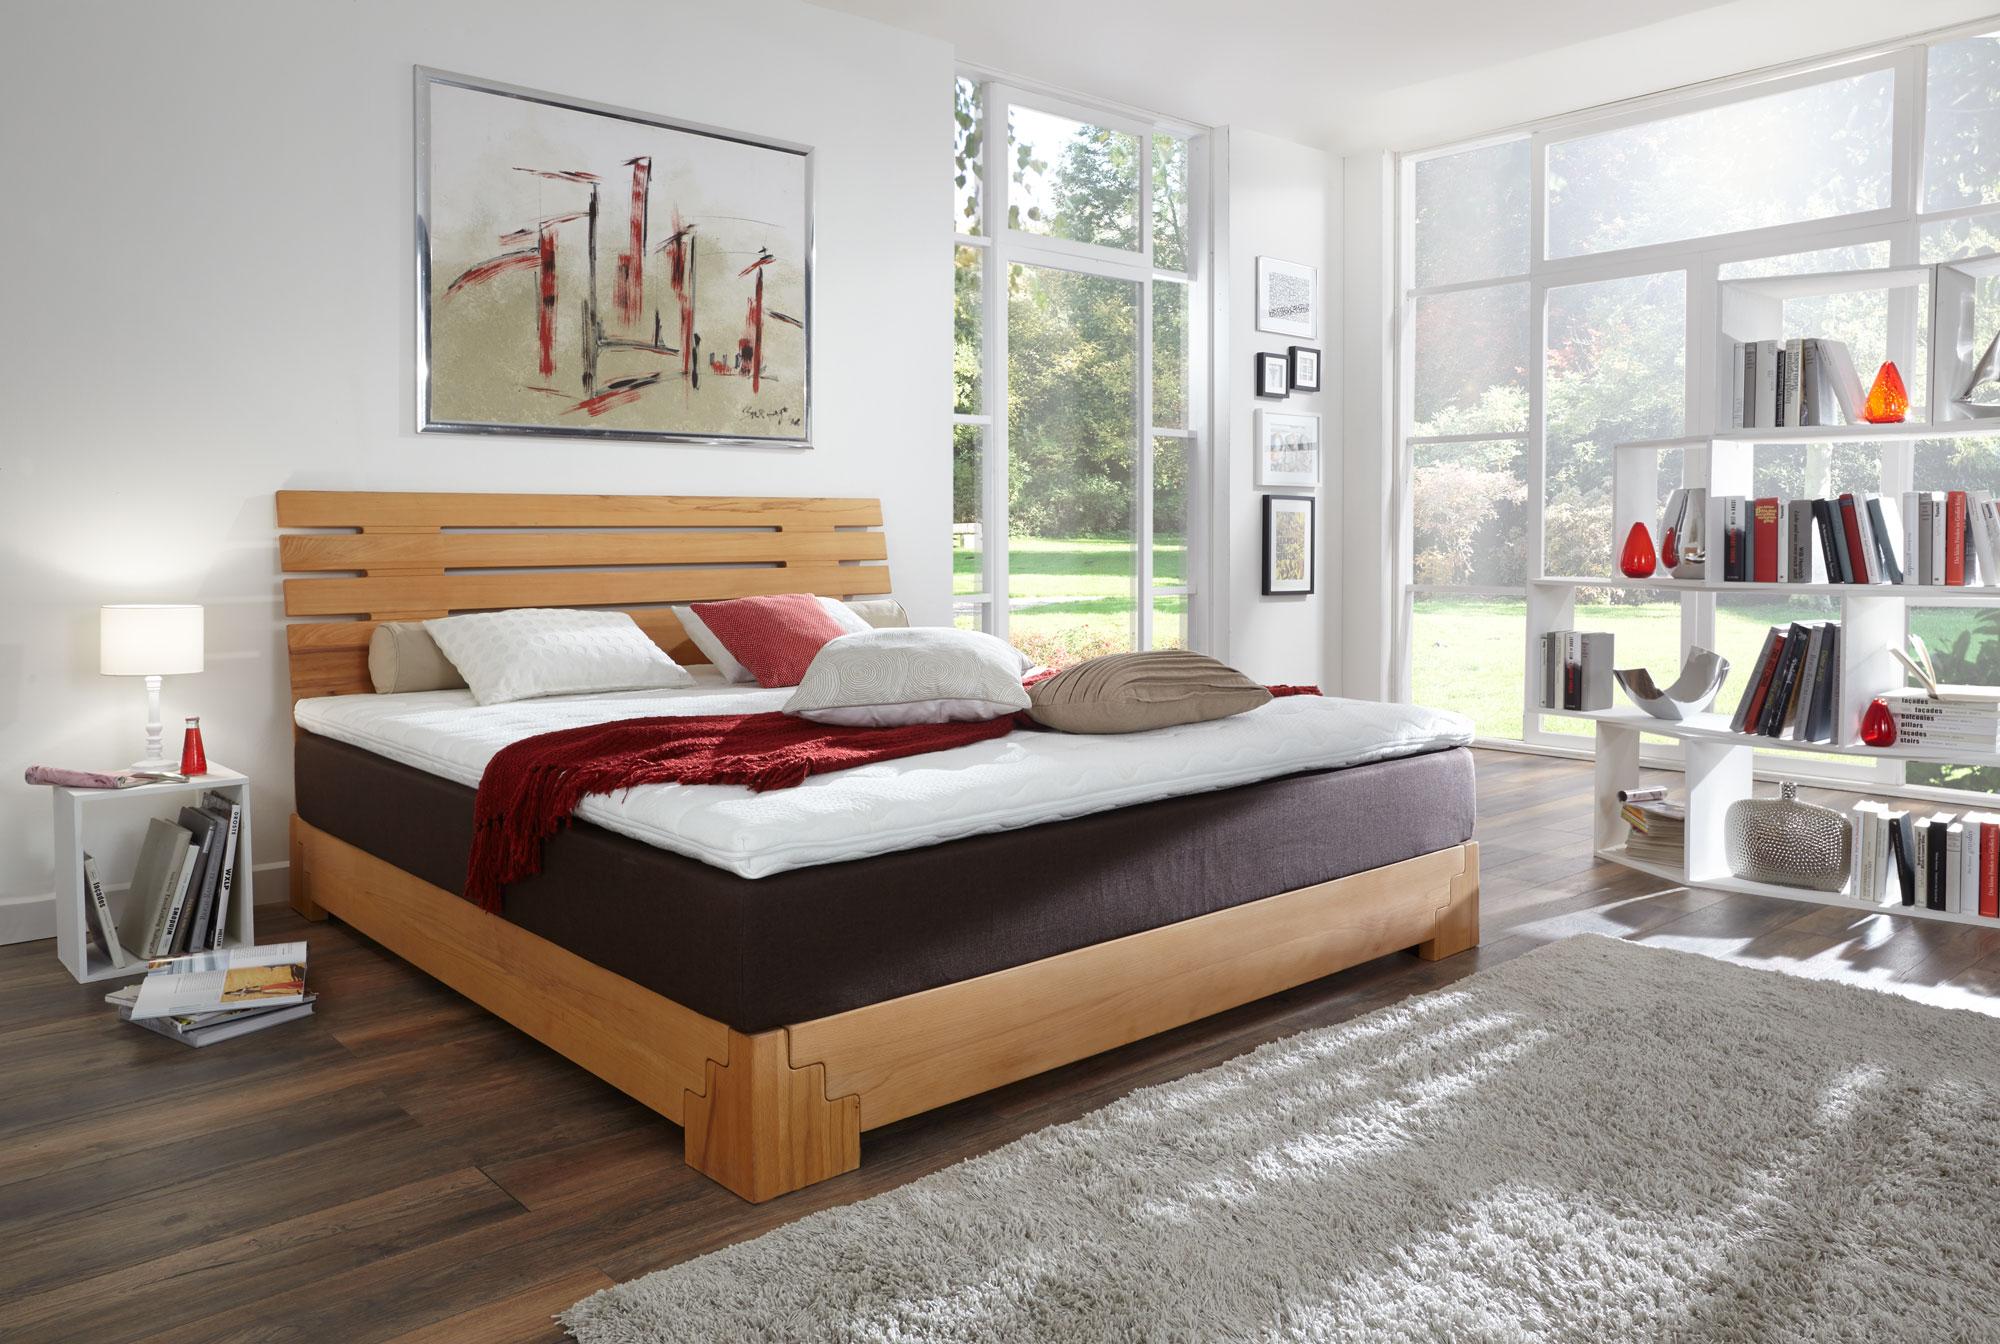 Full Size of Amerikanische Betten Bonprix Rauch 140x200 Frankfurt Teenager Küche Kaufen Ruf Fabrikverkauf Ikea 160x200 Trends Treca 200x200 Jabo Runde Günstige Bett Amerikanische Betten